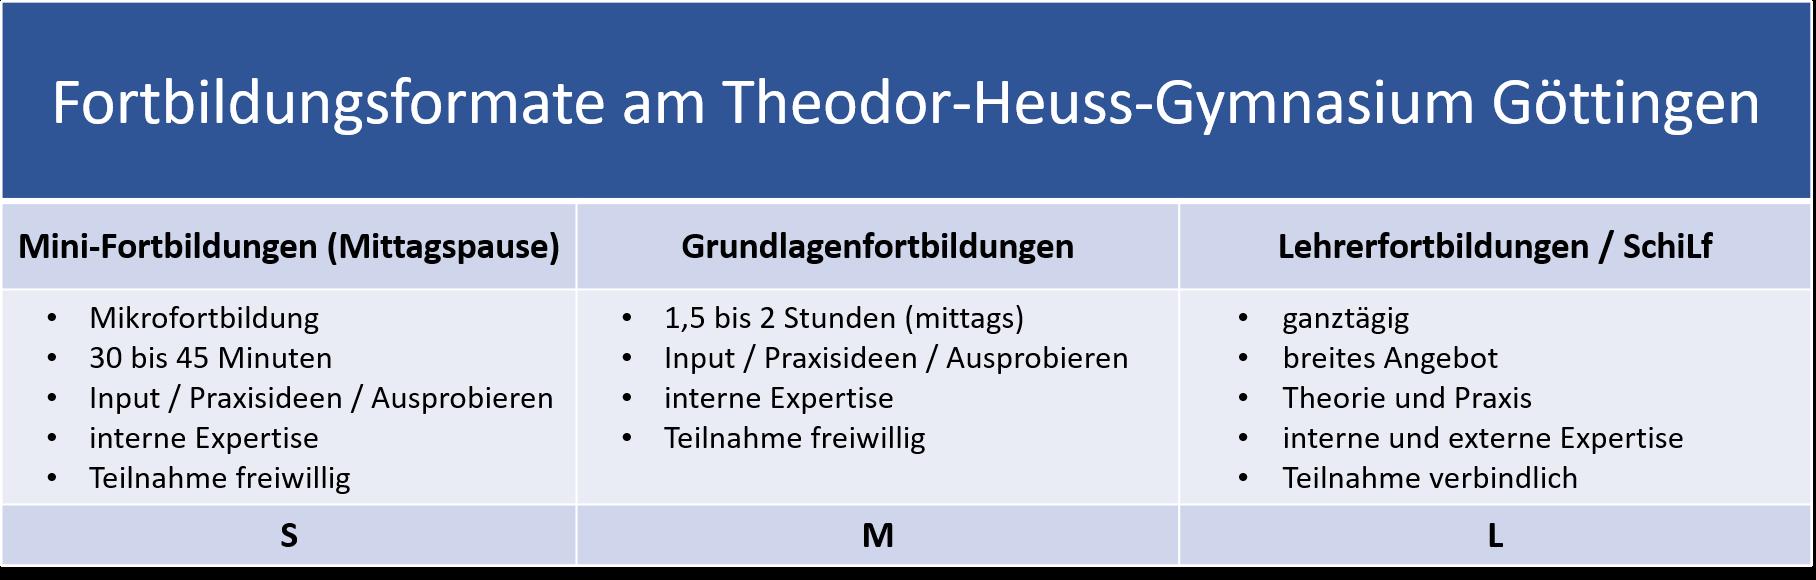 Fortbildungskonzept Theodor Heuss Gymnasium Göttingen